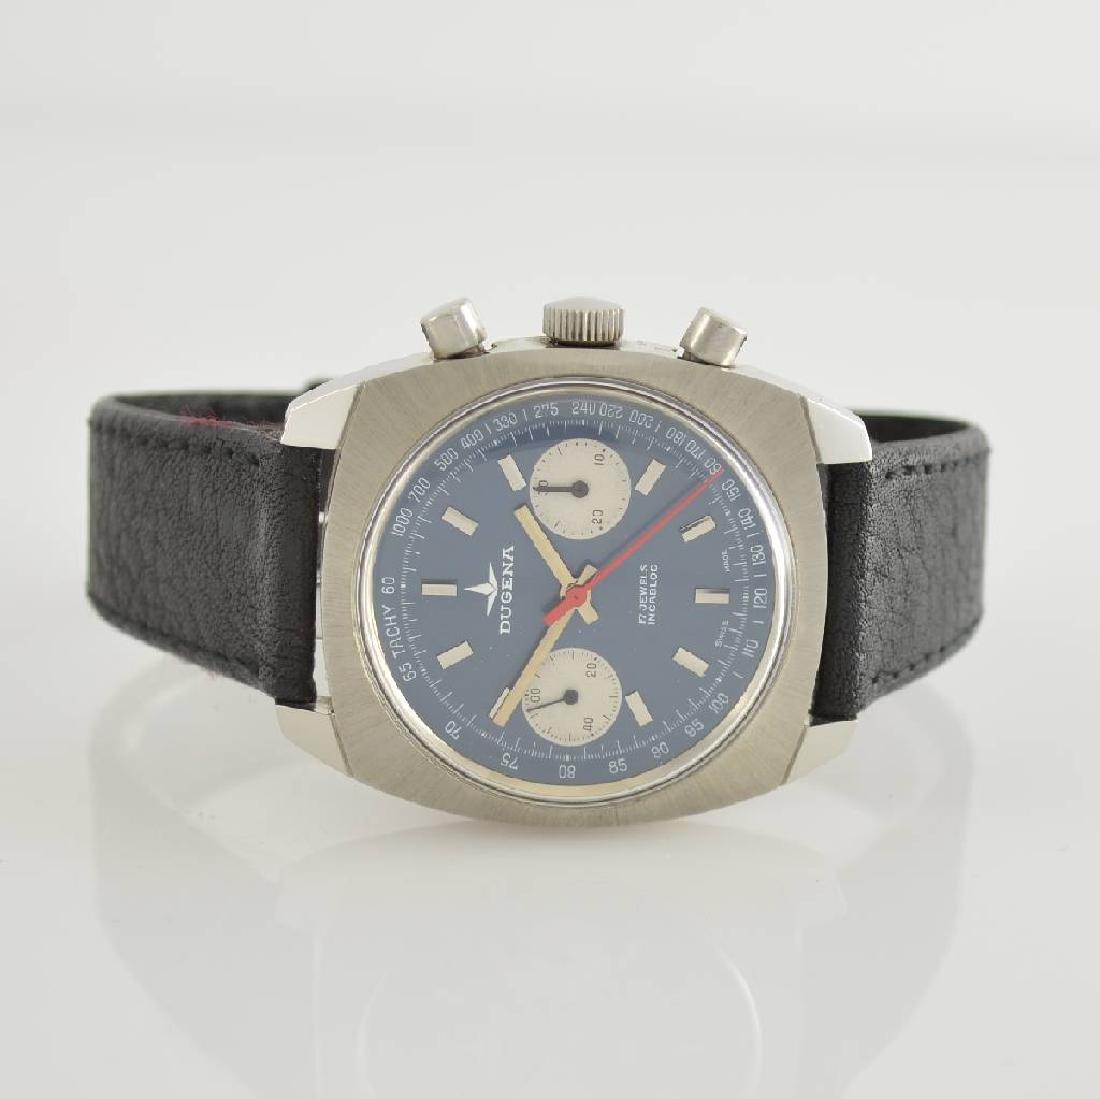 DUGENA unworn gents wristwatch with chronograph